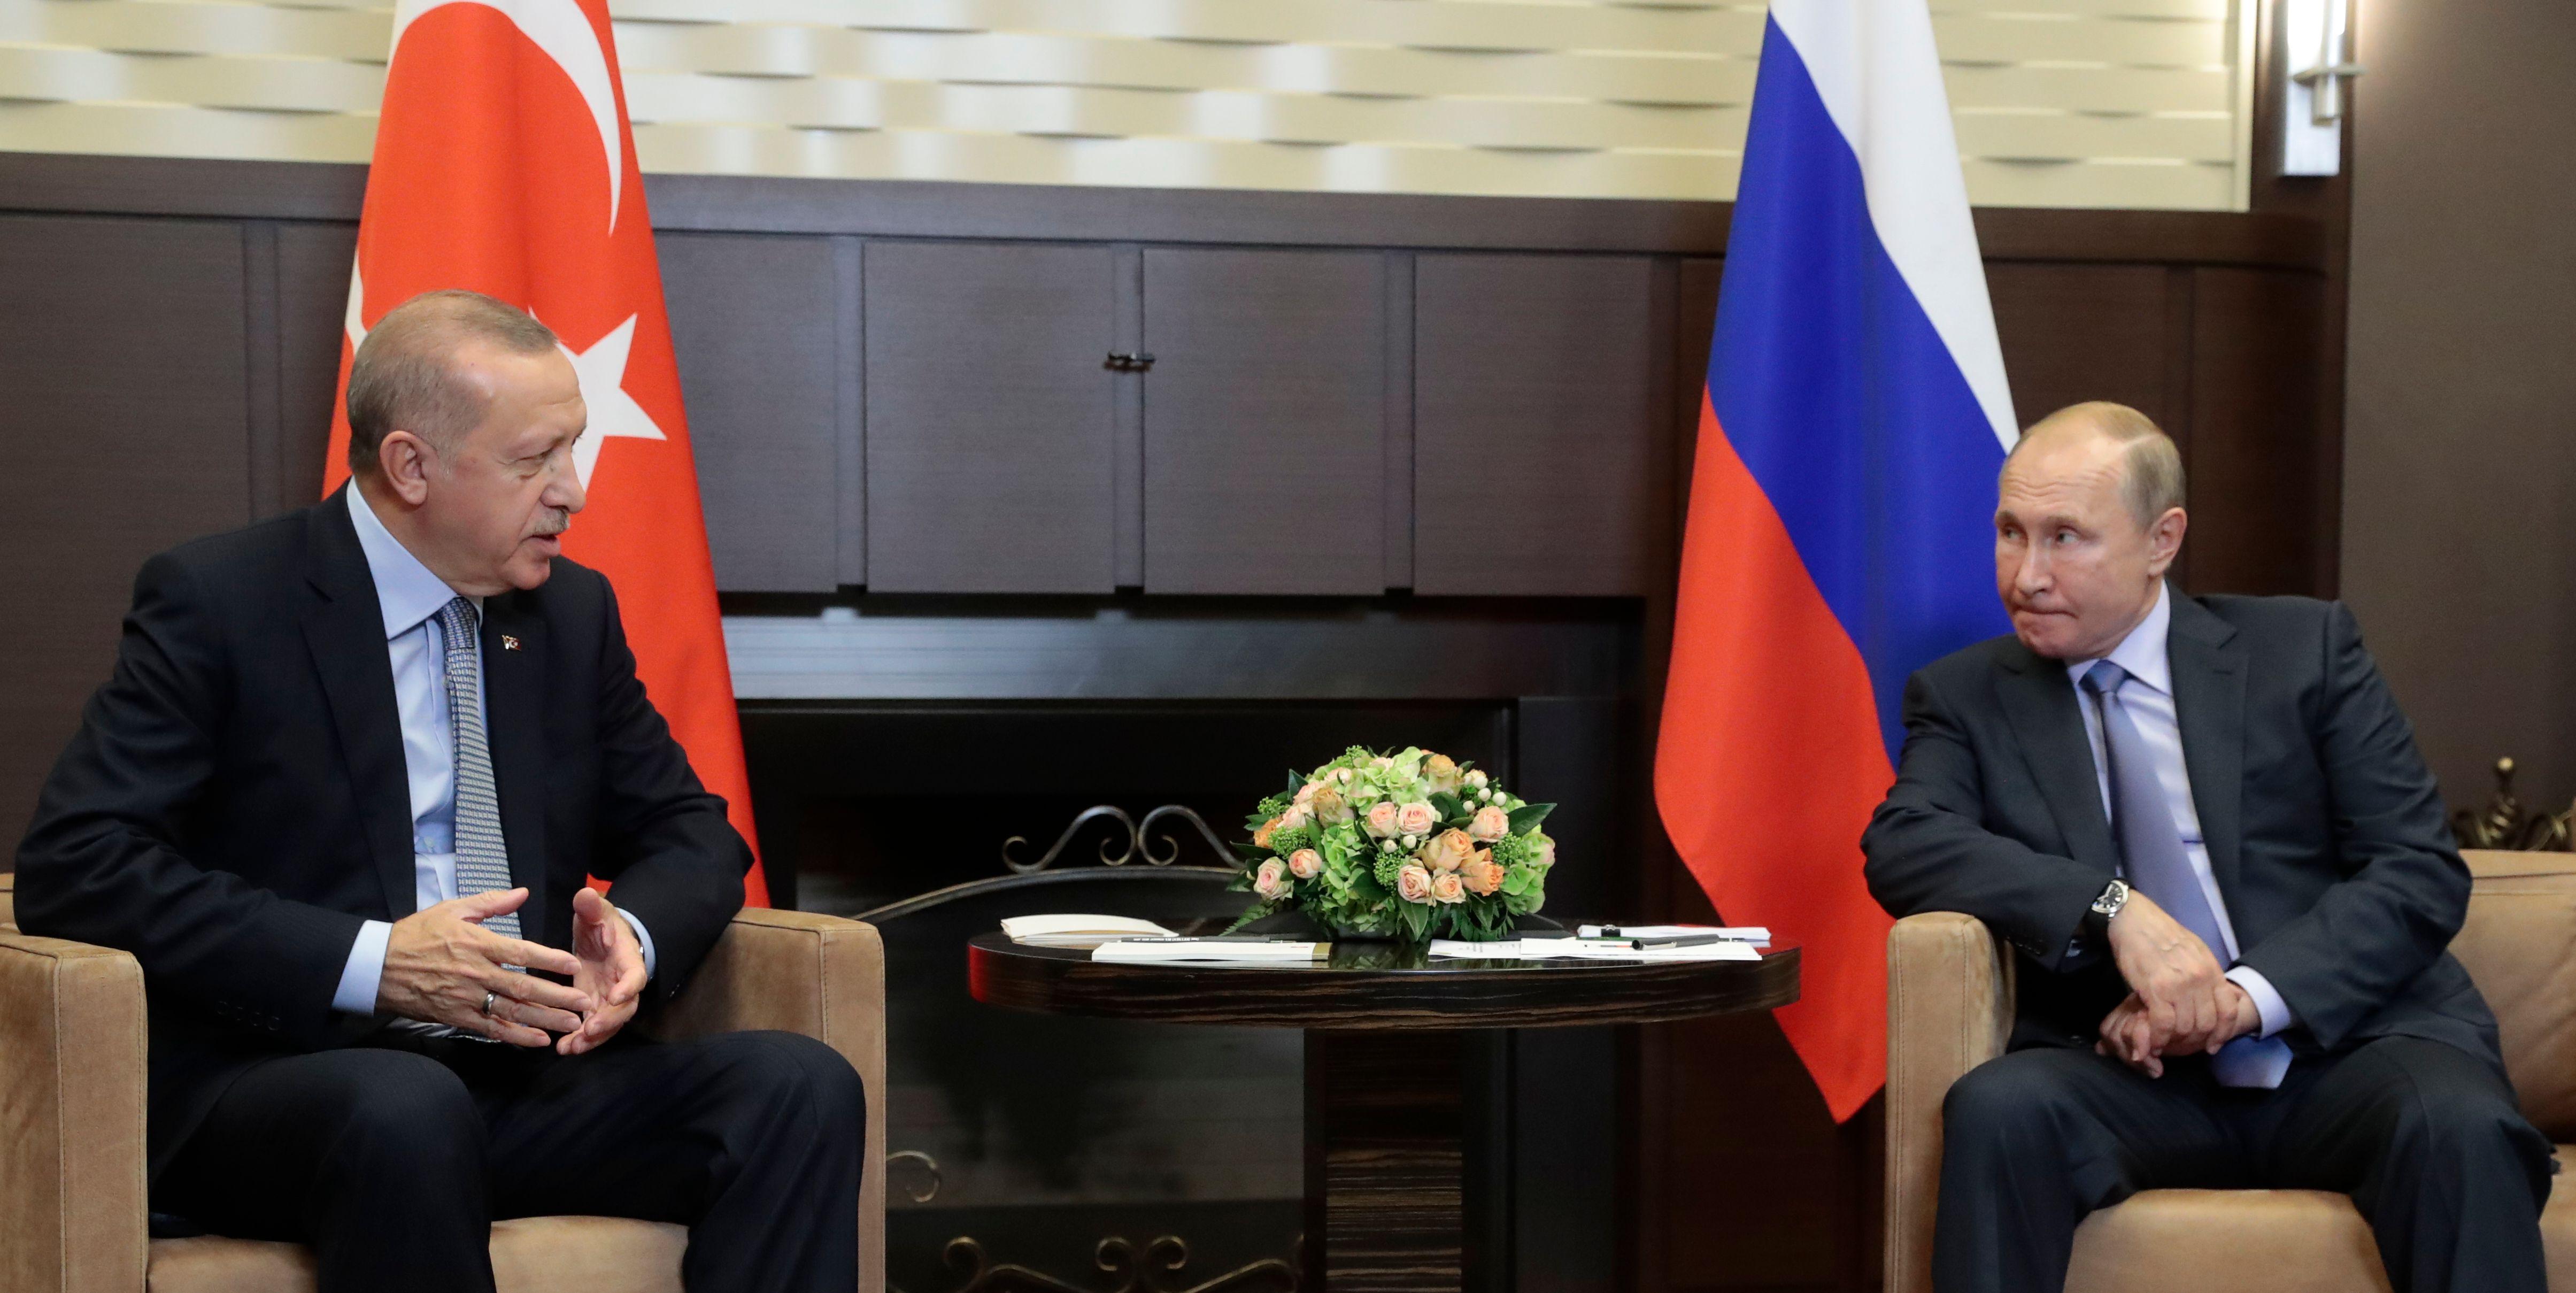 Russian President Vladimir Putin meets with his Turkish counterpart Recep Tayyip Erdogan in Sochi on Oct. 22, 2019.